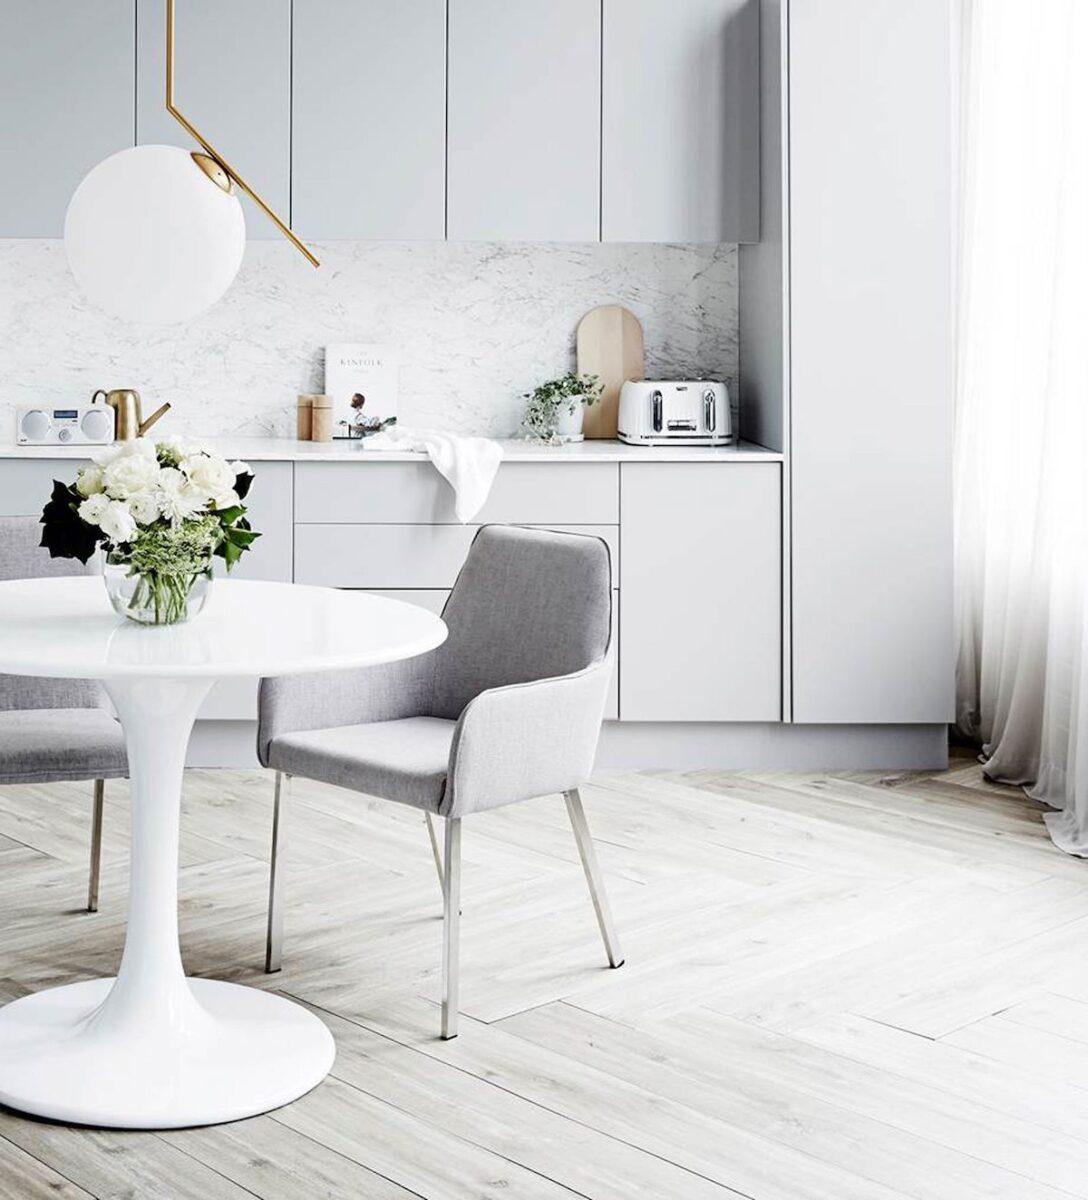 cucina-scandinava-bianca-11